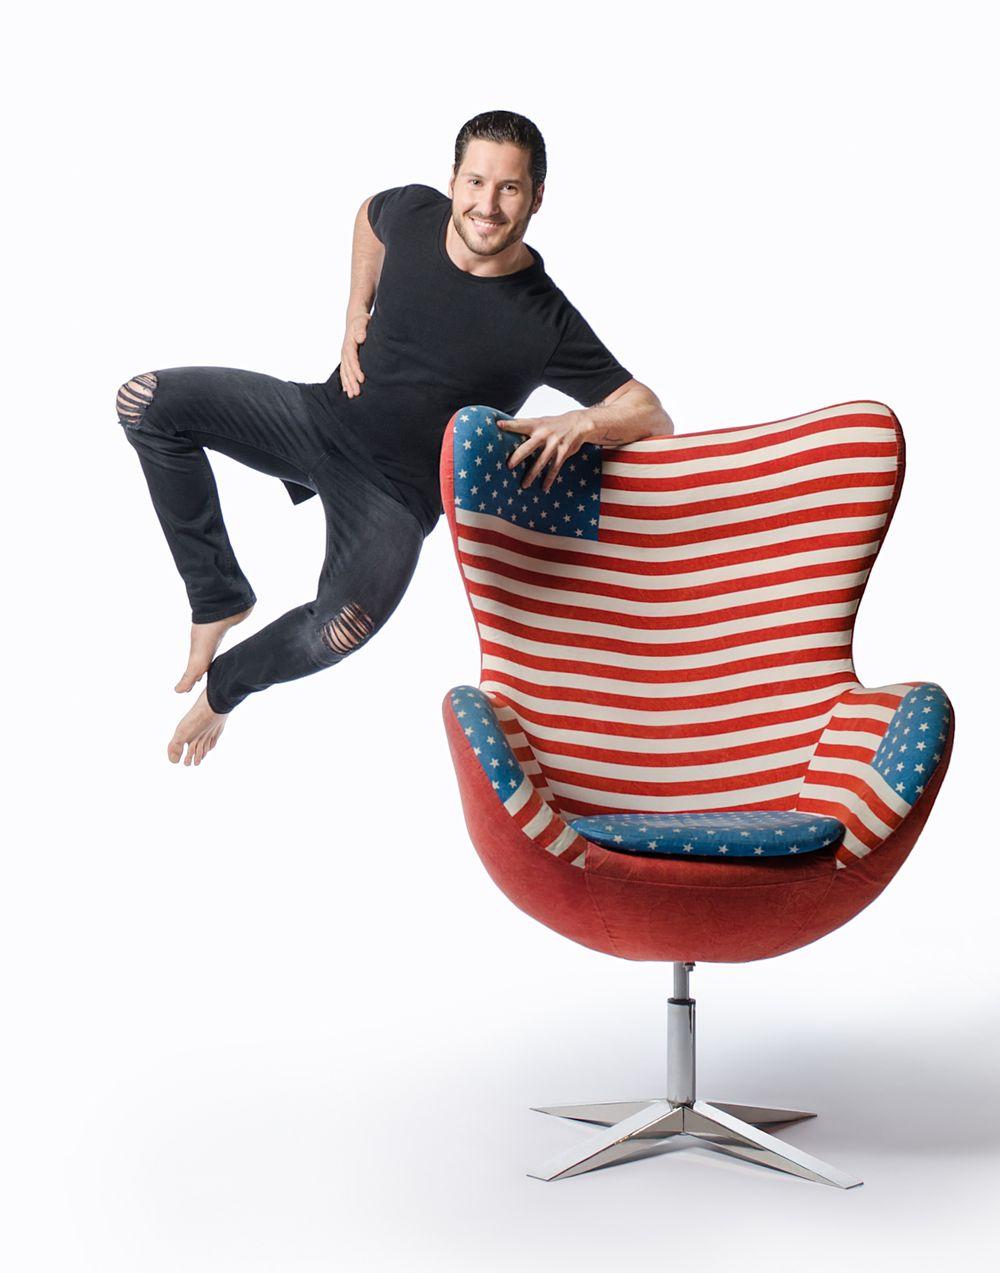 Valentin Chmerkovskiy For Inside Dance Magazing